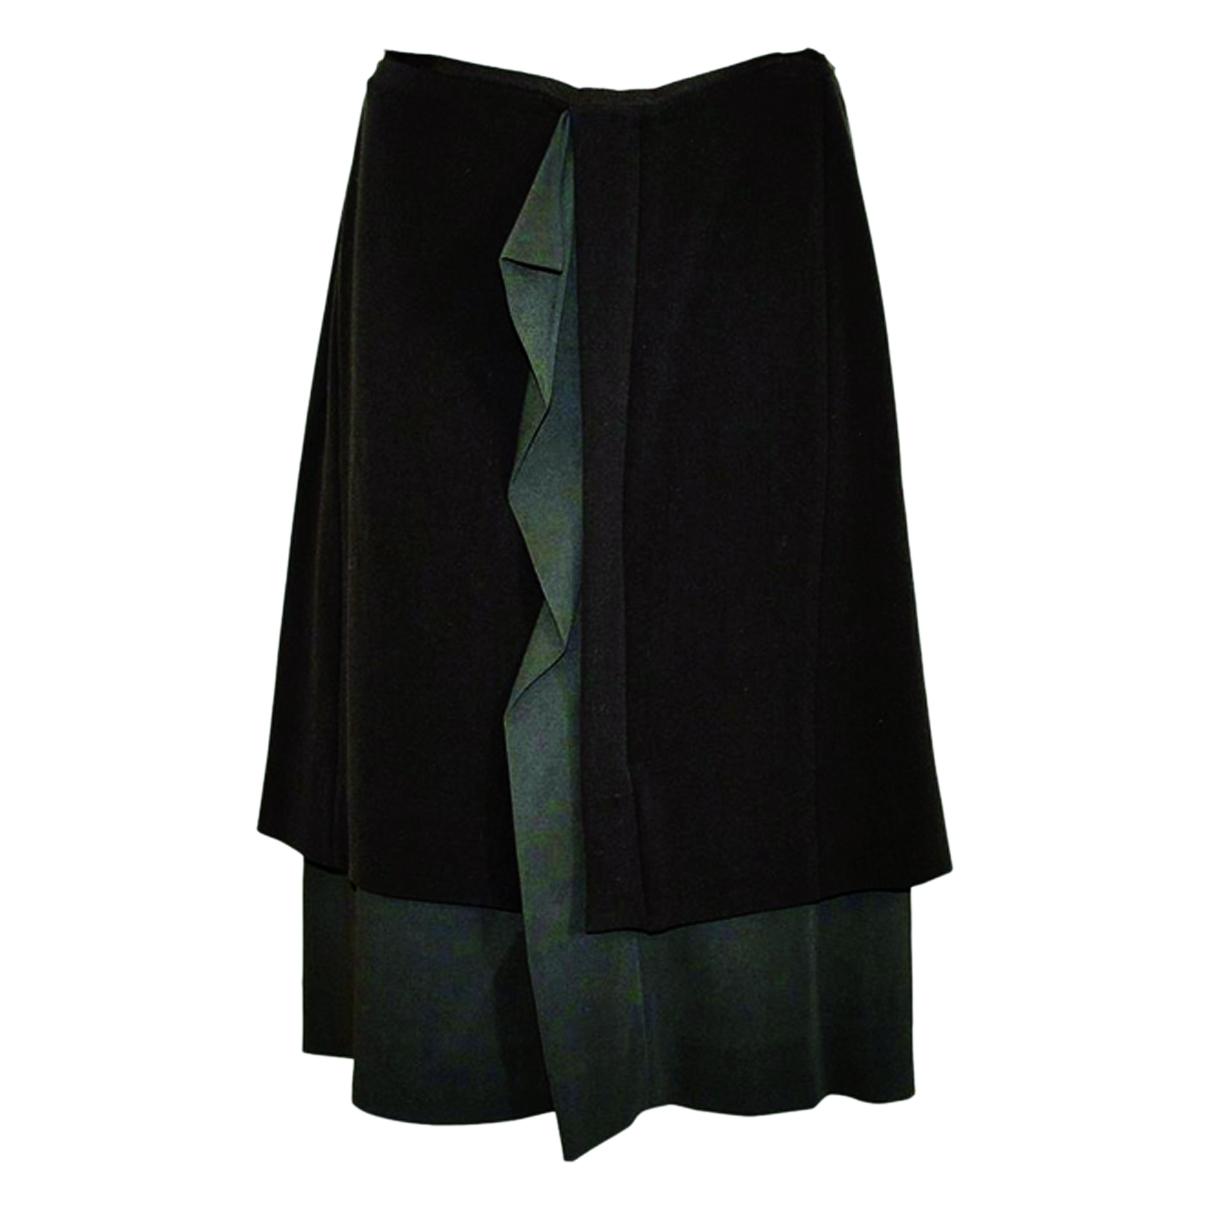 Marni \N Wool skirt for Women 42 IT